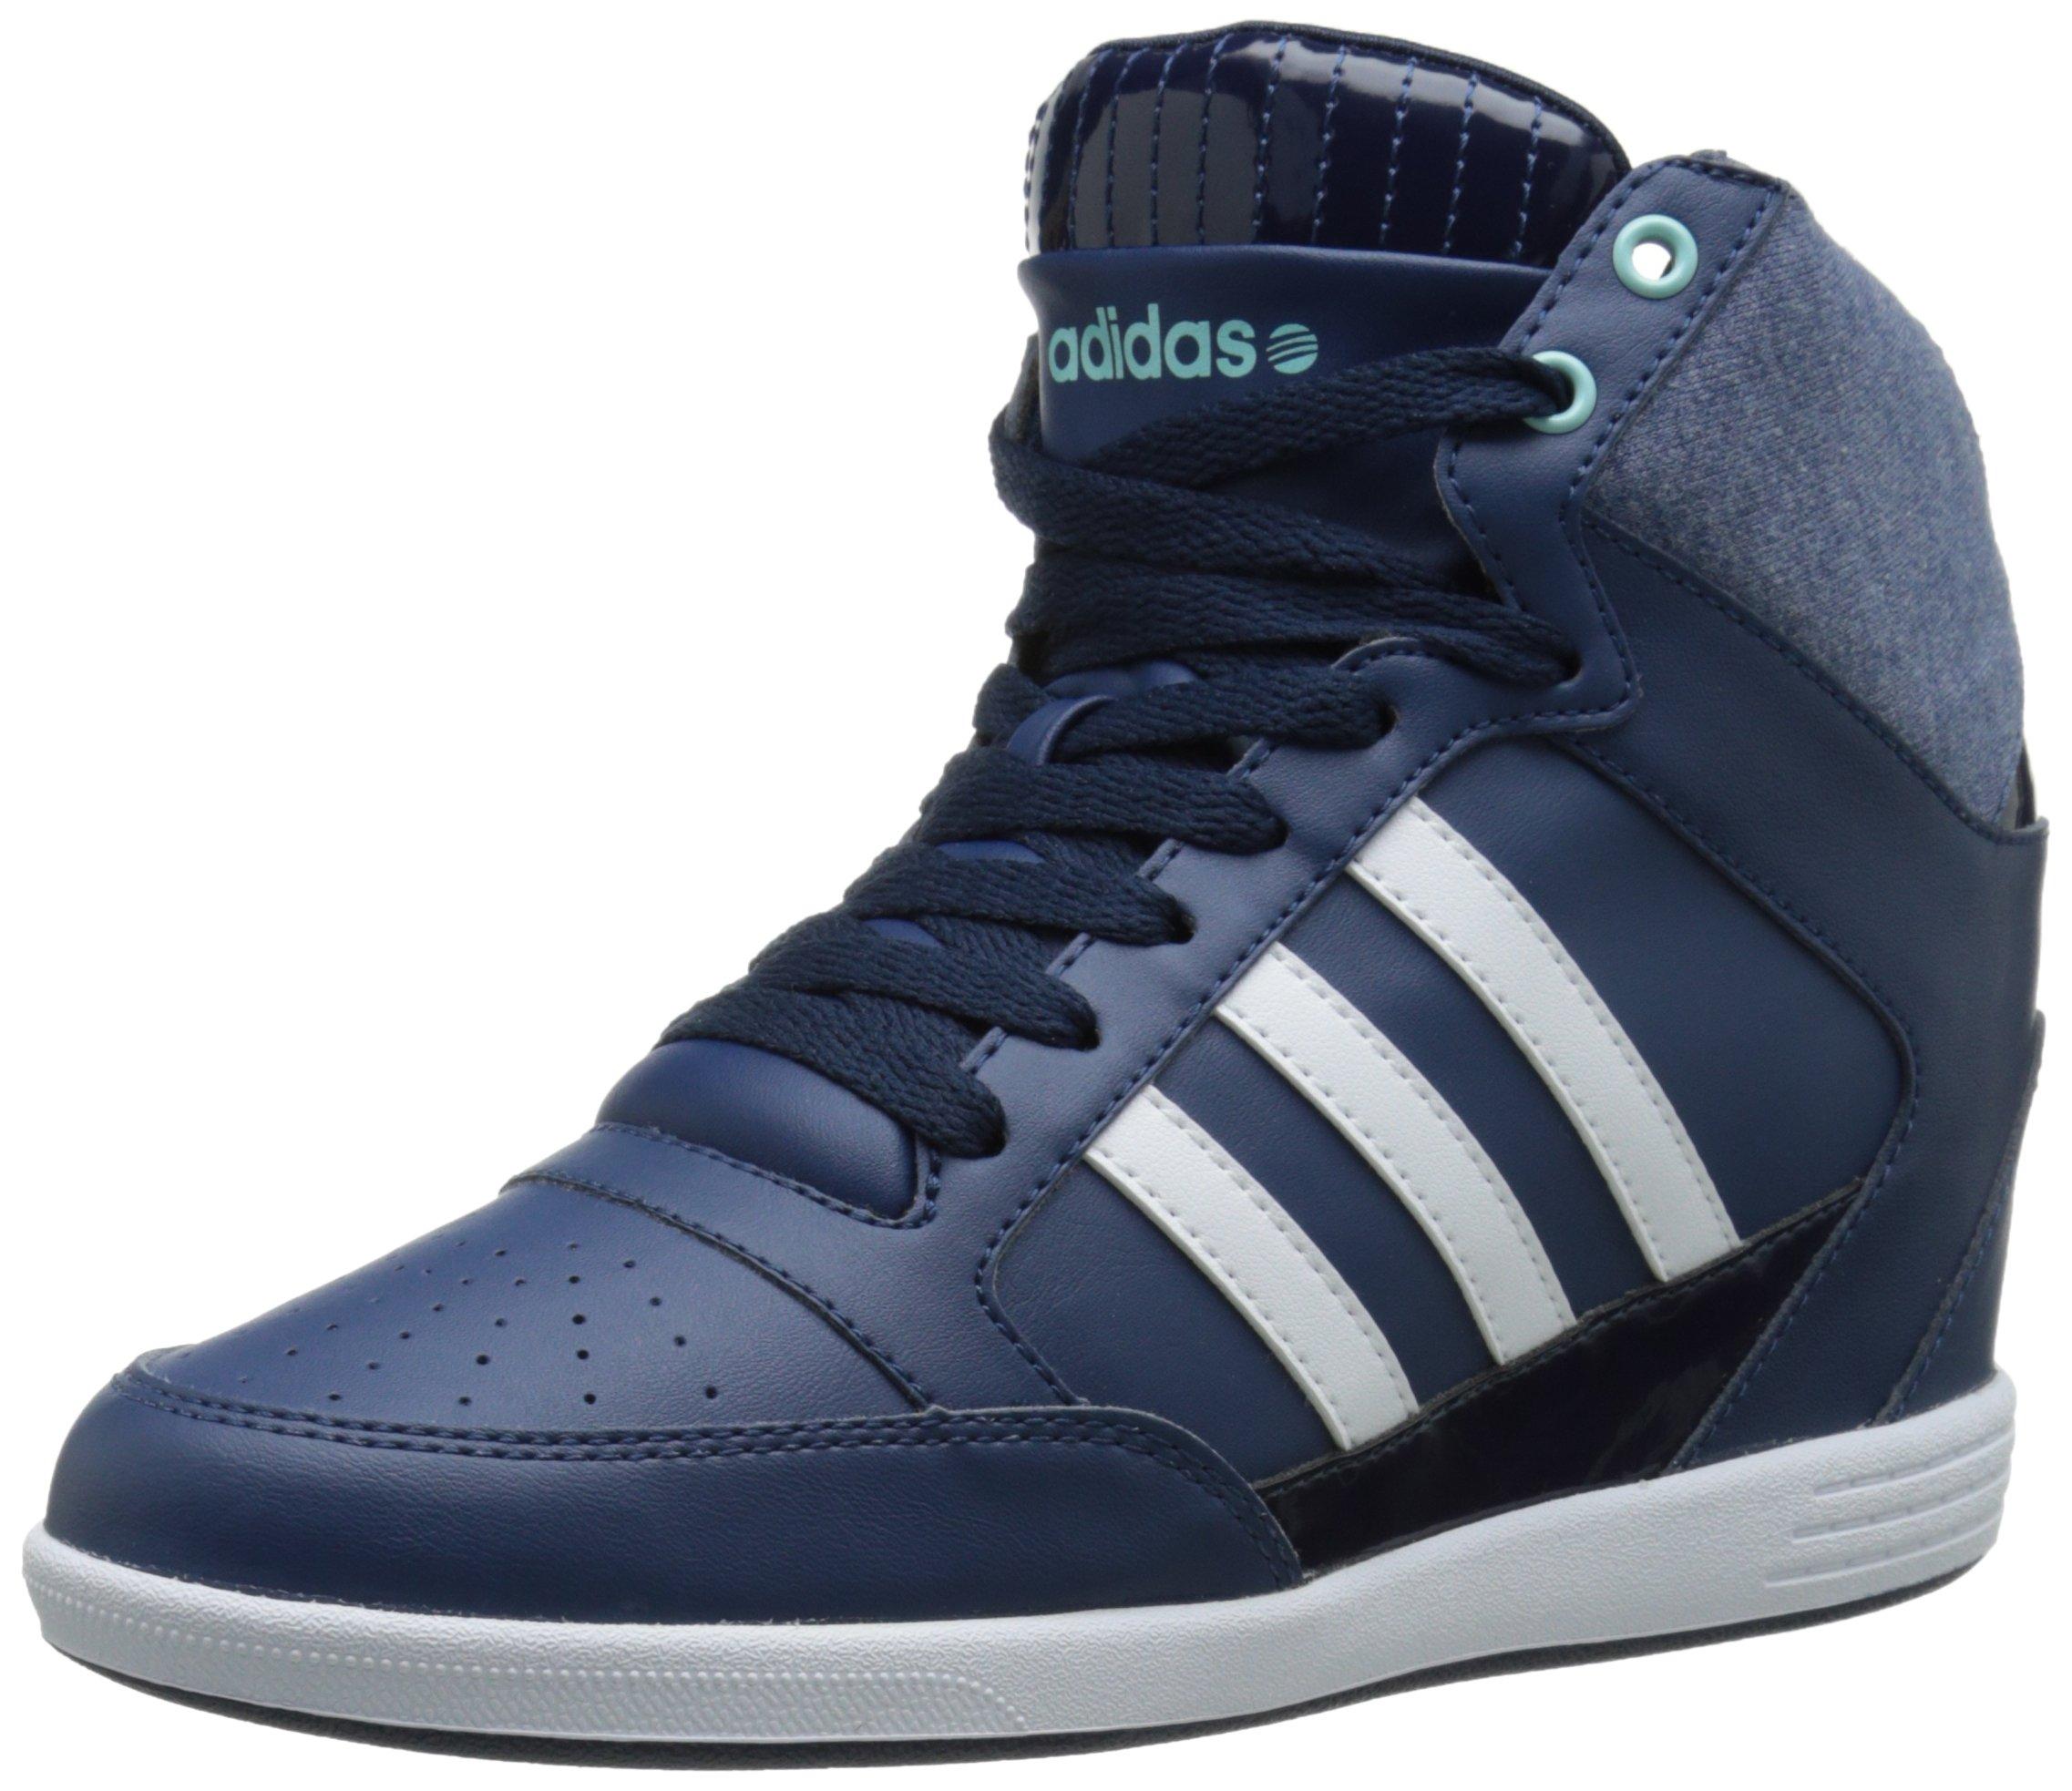 06de0ccb1b1d6 Galleon - Adidas NEO Women's Super Wedge W High-Top Fashion Sneaker, Blue/  White/ Light Blue, 8 M US